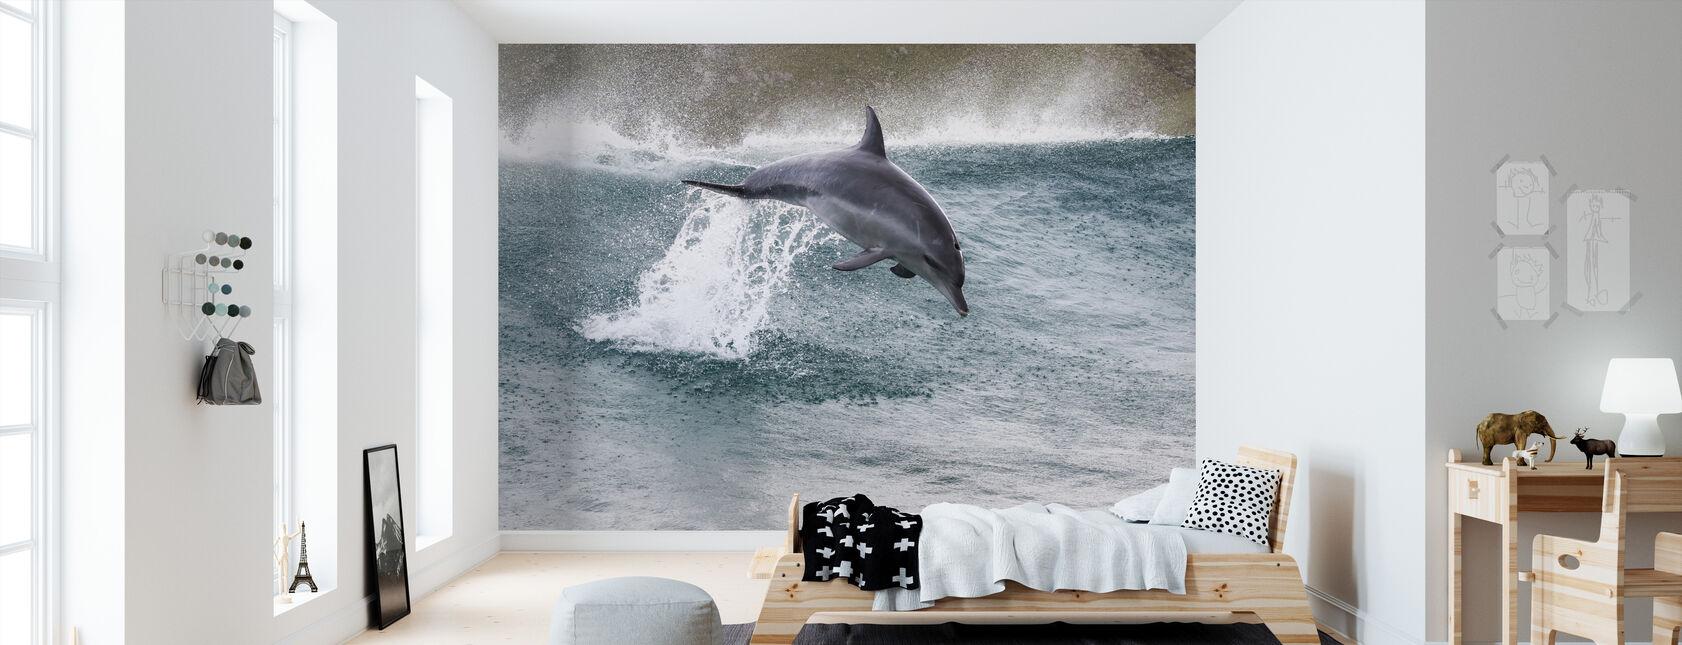 Indo-Pacific Bottlenose Dolphin - Wallpaper - Kids Room